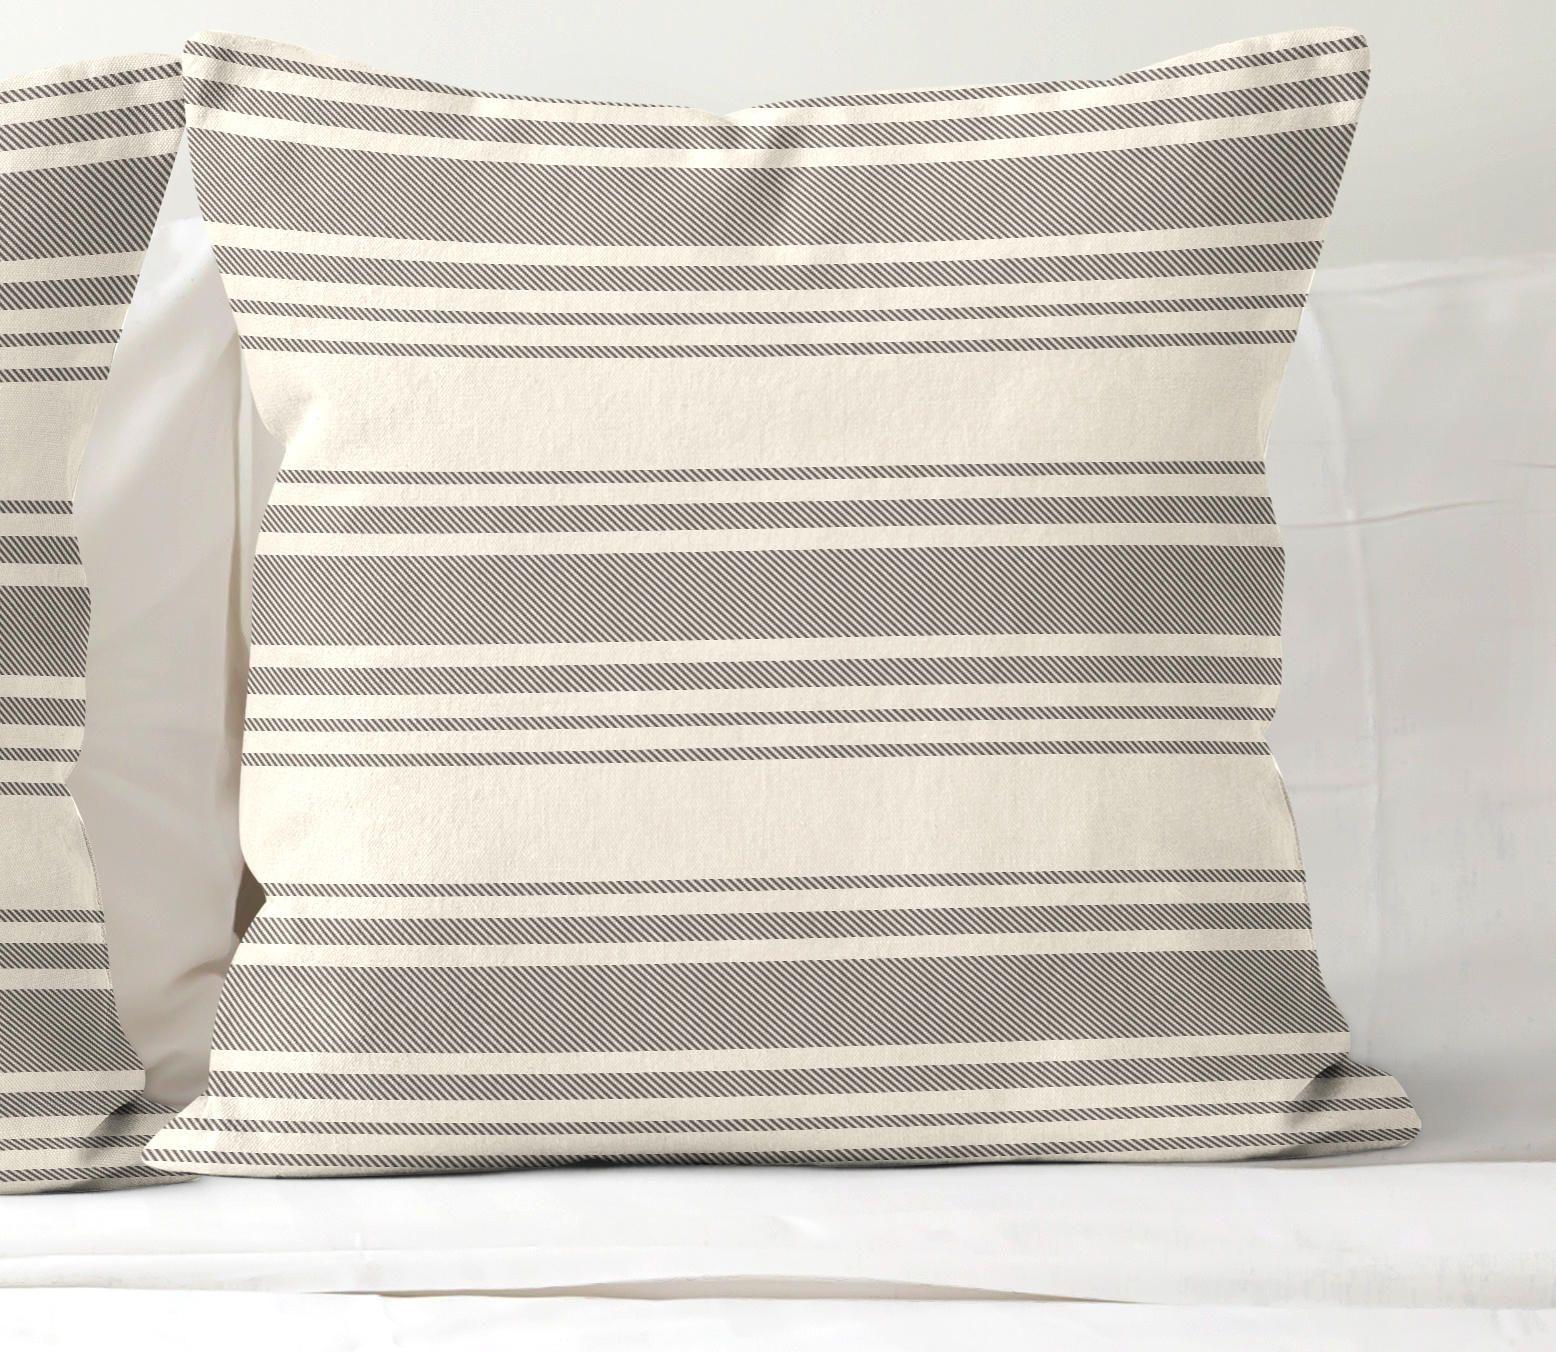 Farmhouse Ticking 24x24 Pillow Cover